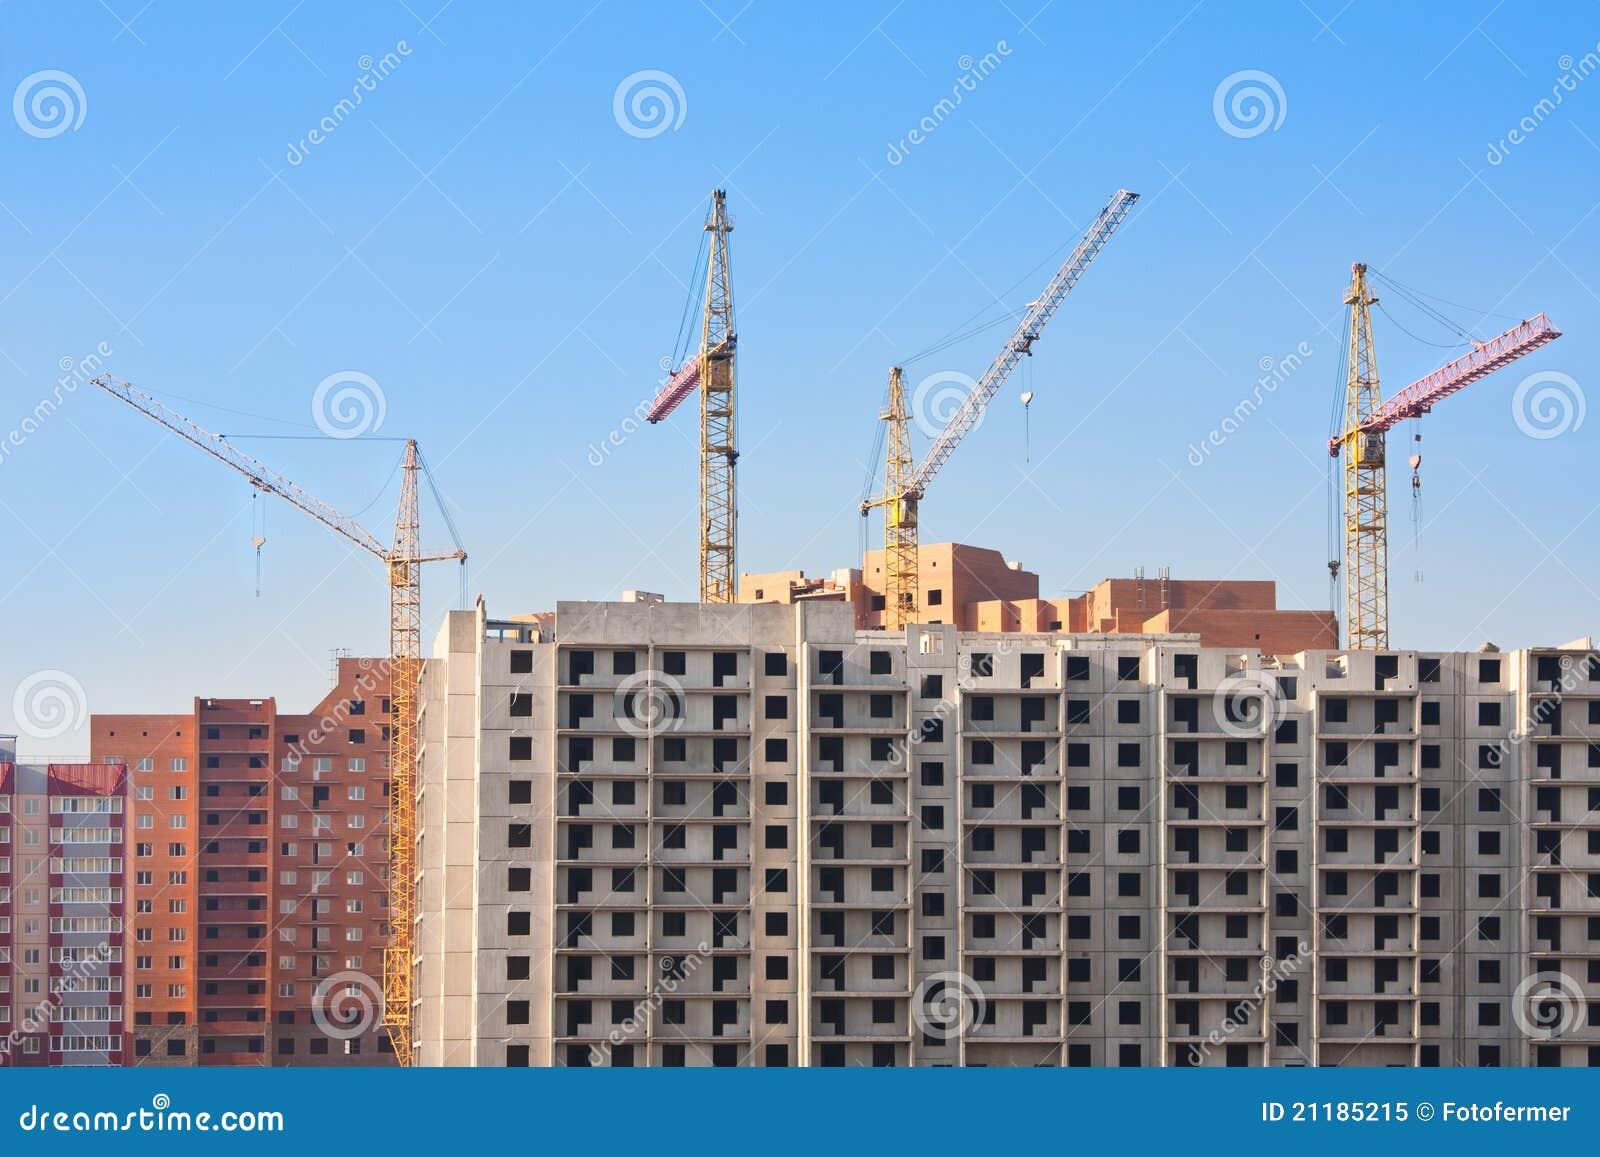 Big construction